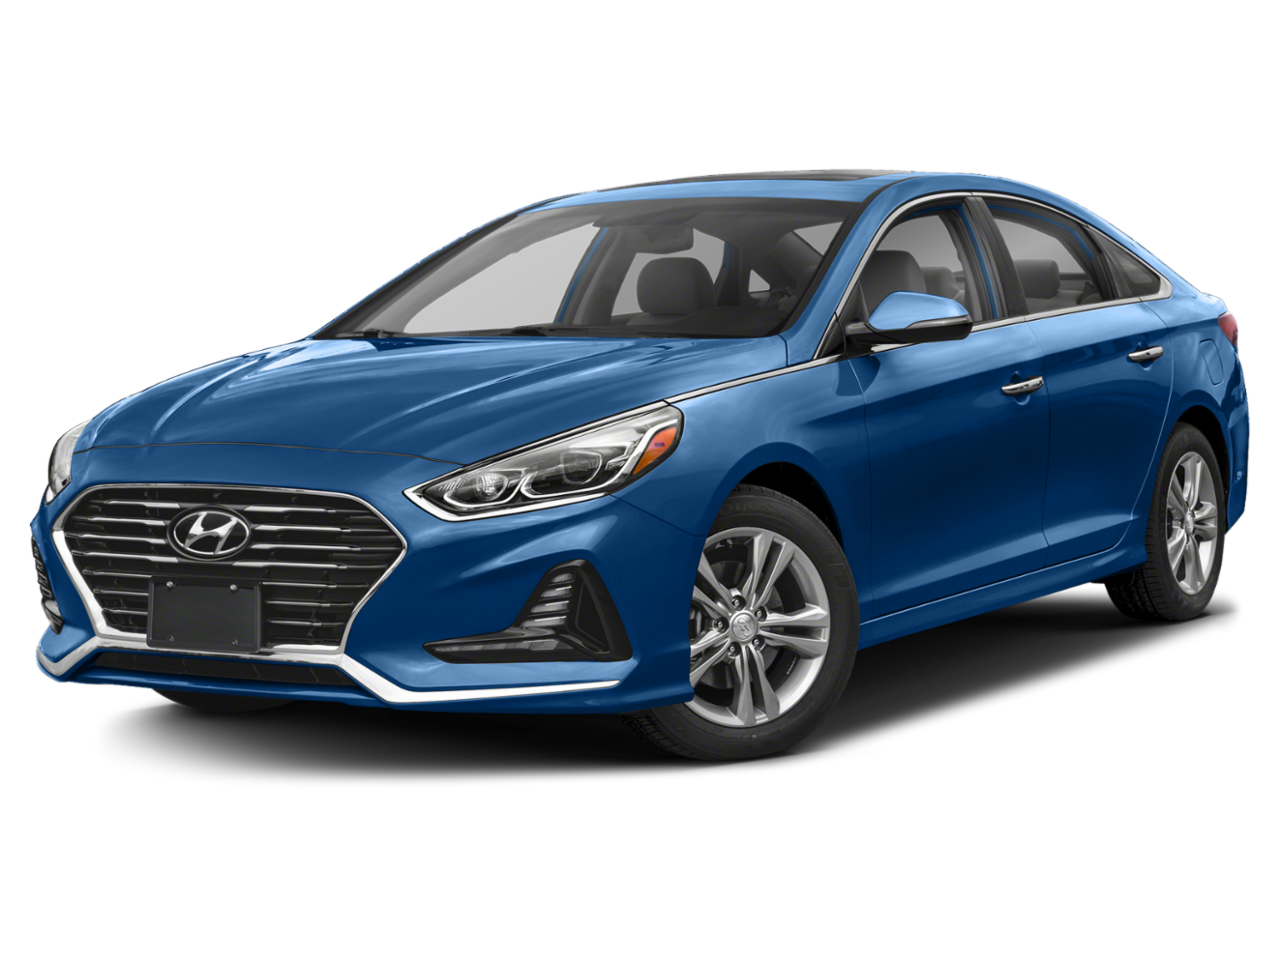 New 2019 Hyundai Sonata Limited